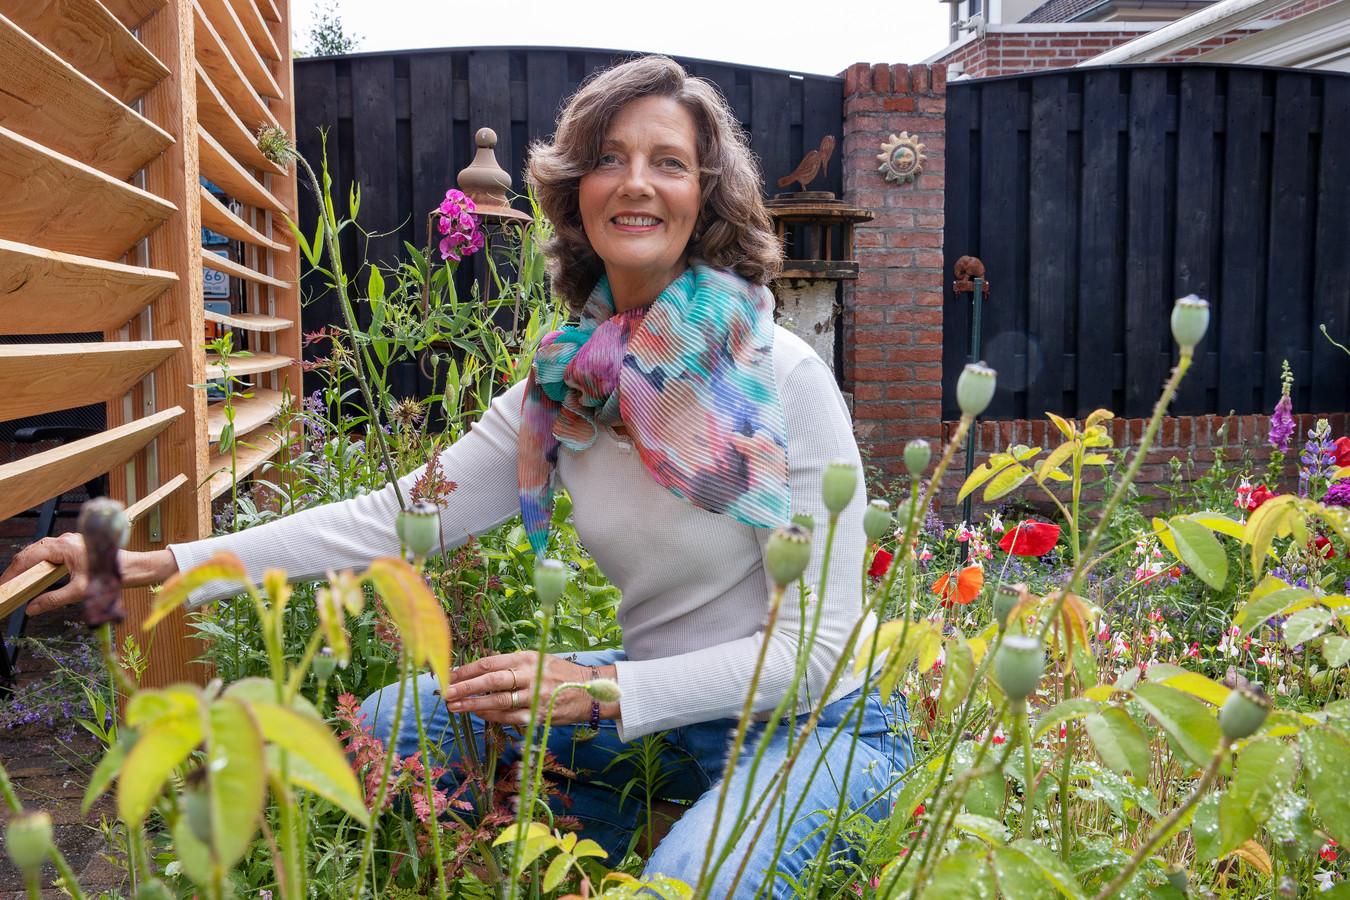 Lianne Stevens in haar bloemrijke tuin in Waalre